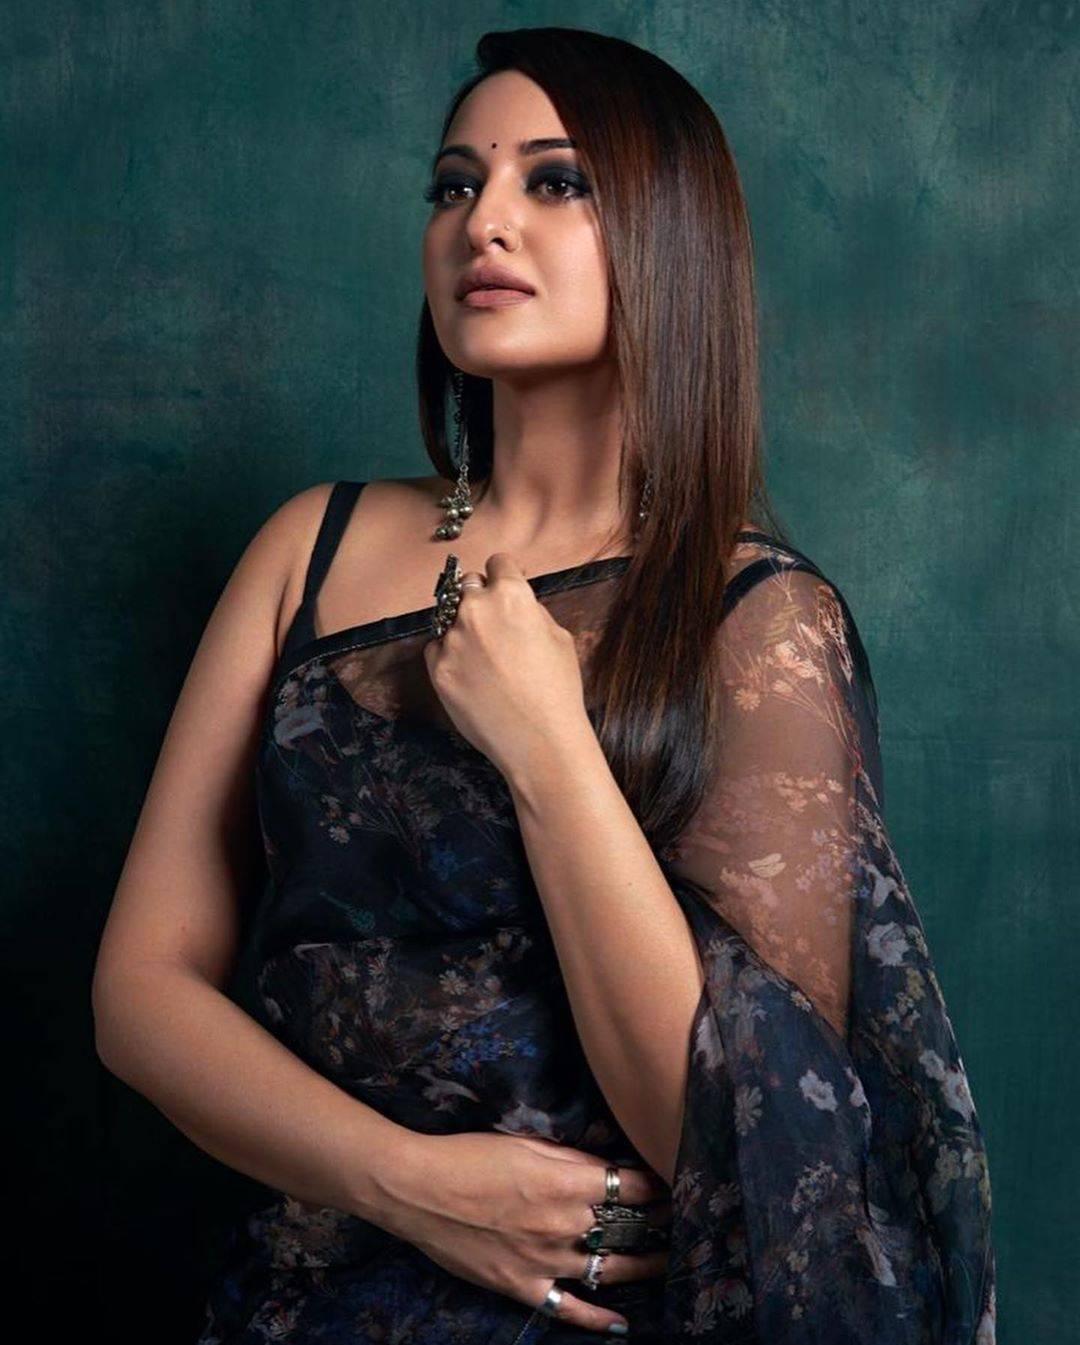 Sonakshi Sinha shuts down trolls who called her a 'buffalo'